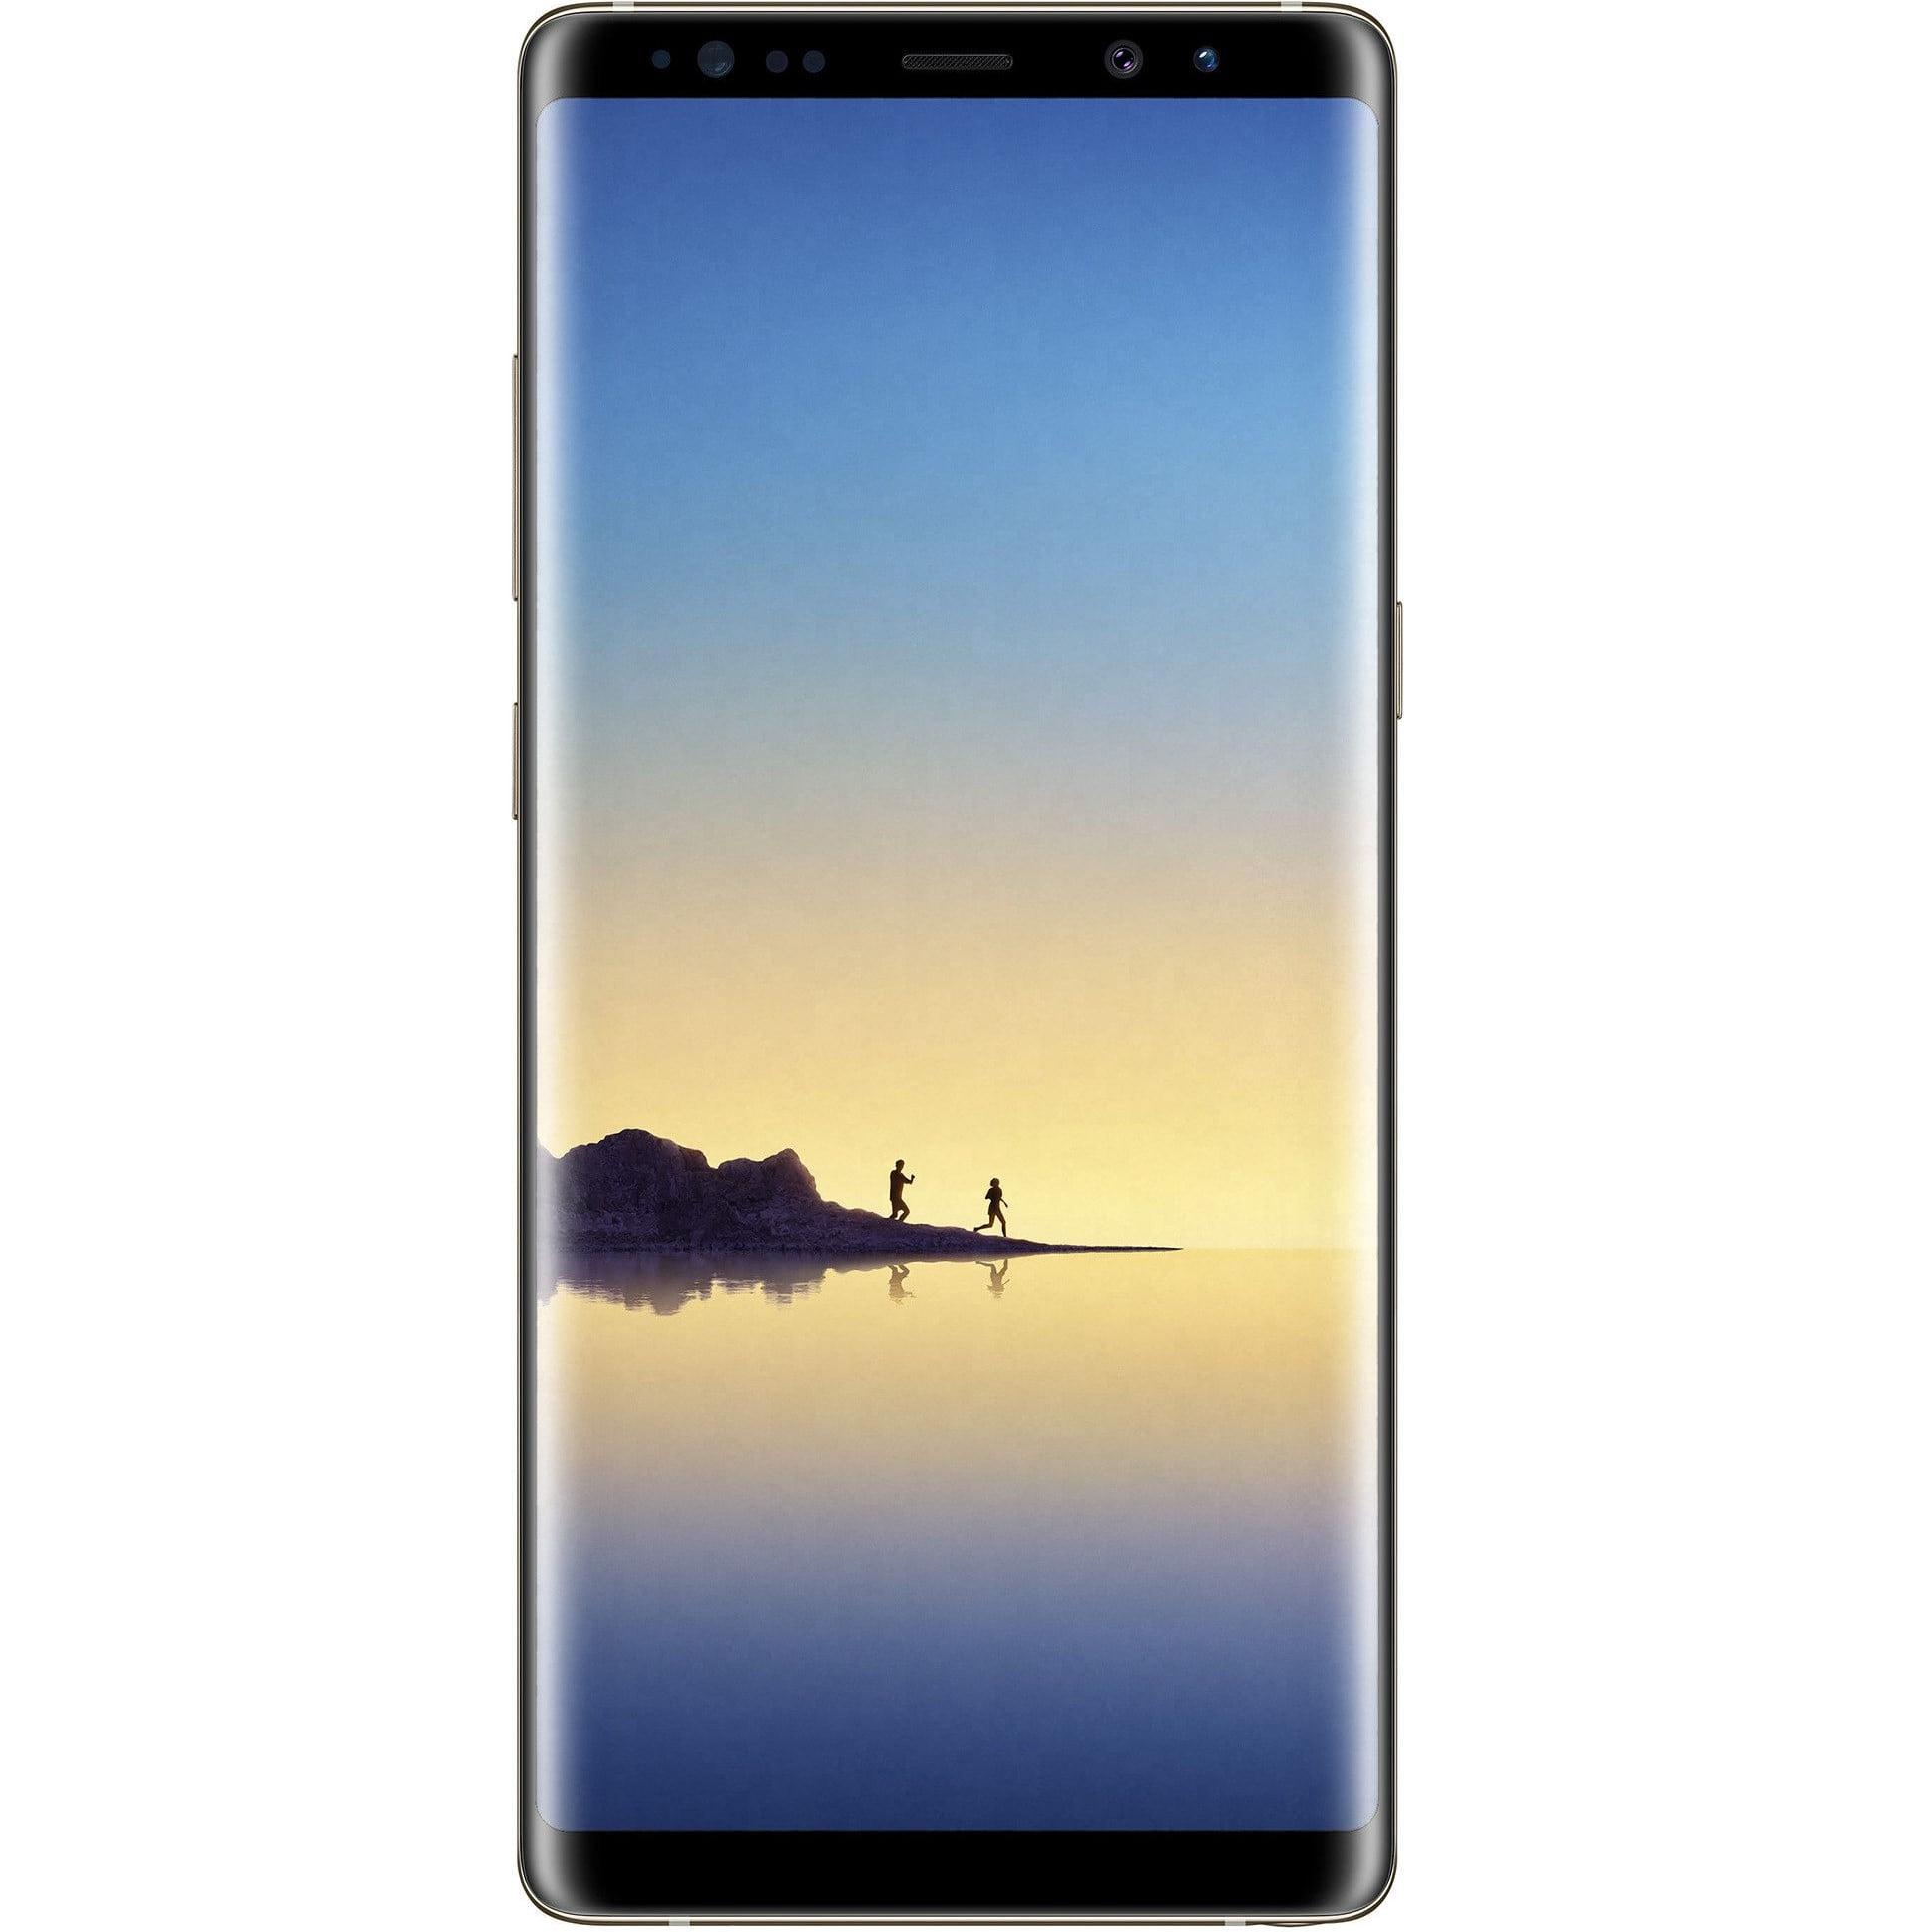 Telefon mobil Samsung Galaxy Note 8, Dual SIM, 64GB, 6GB RAM, 4G, Orchid Gray